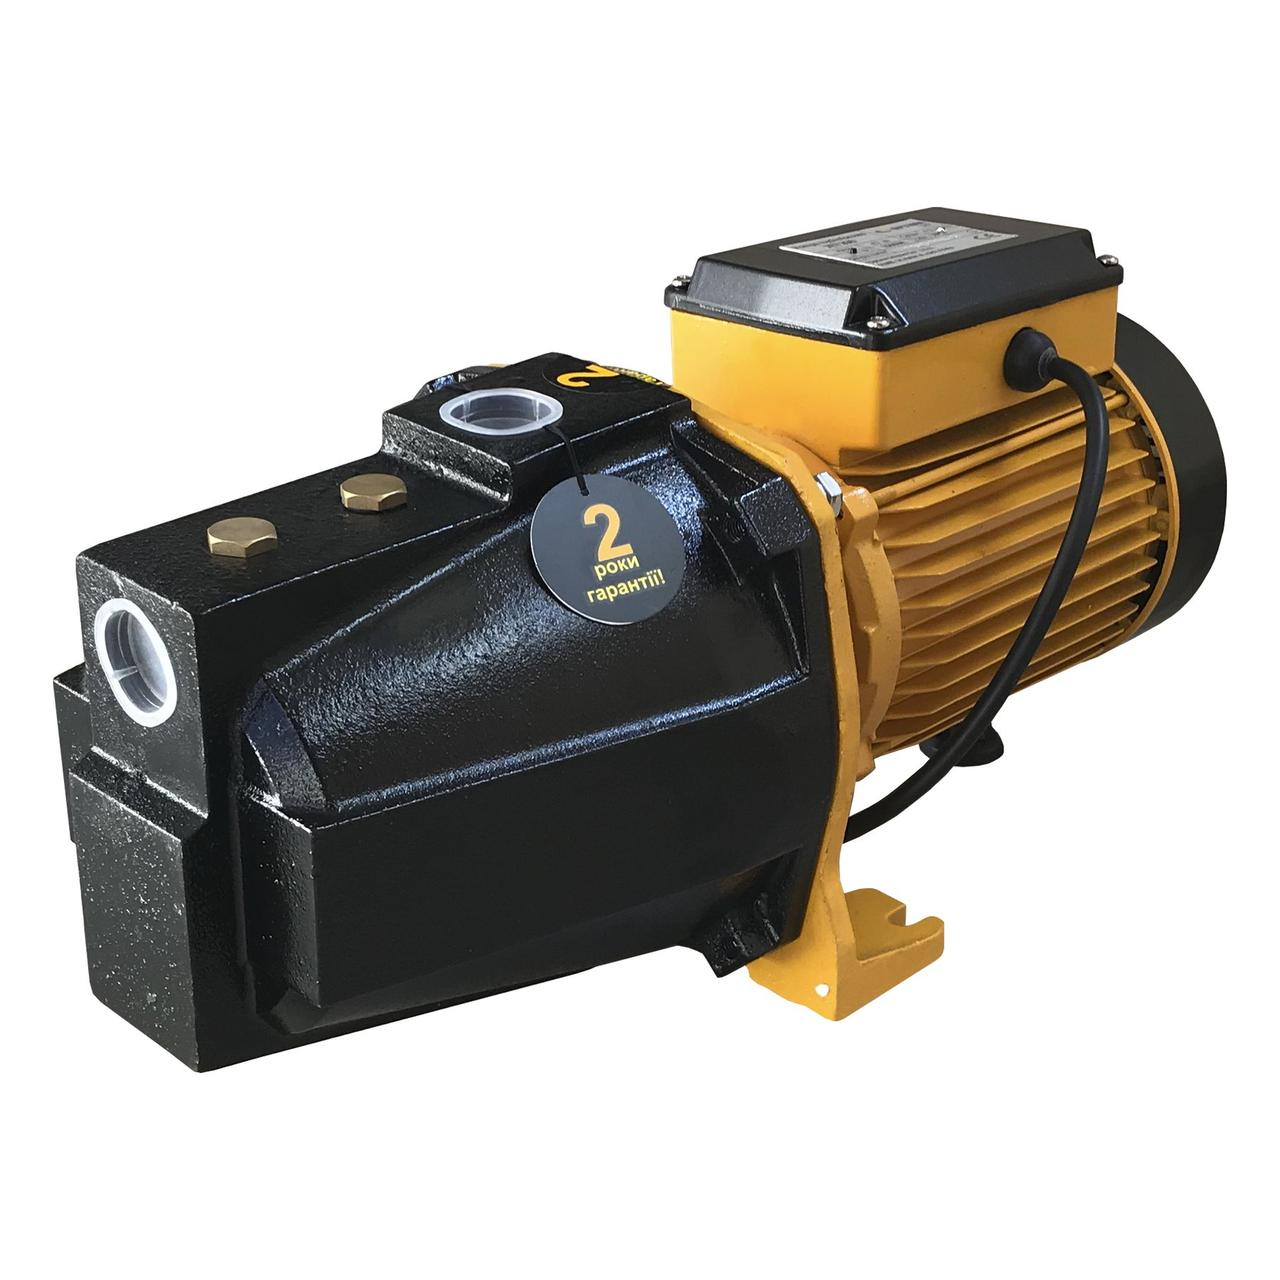 Насос центробежный Optima JET200 1,5 кВт чугун длинный